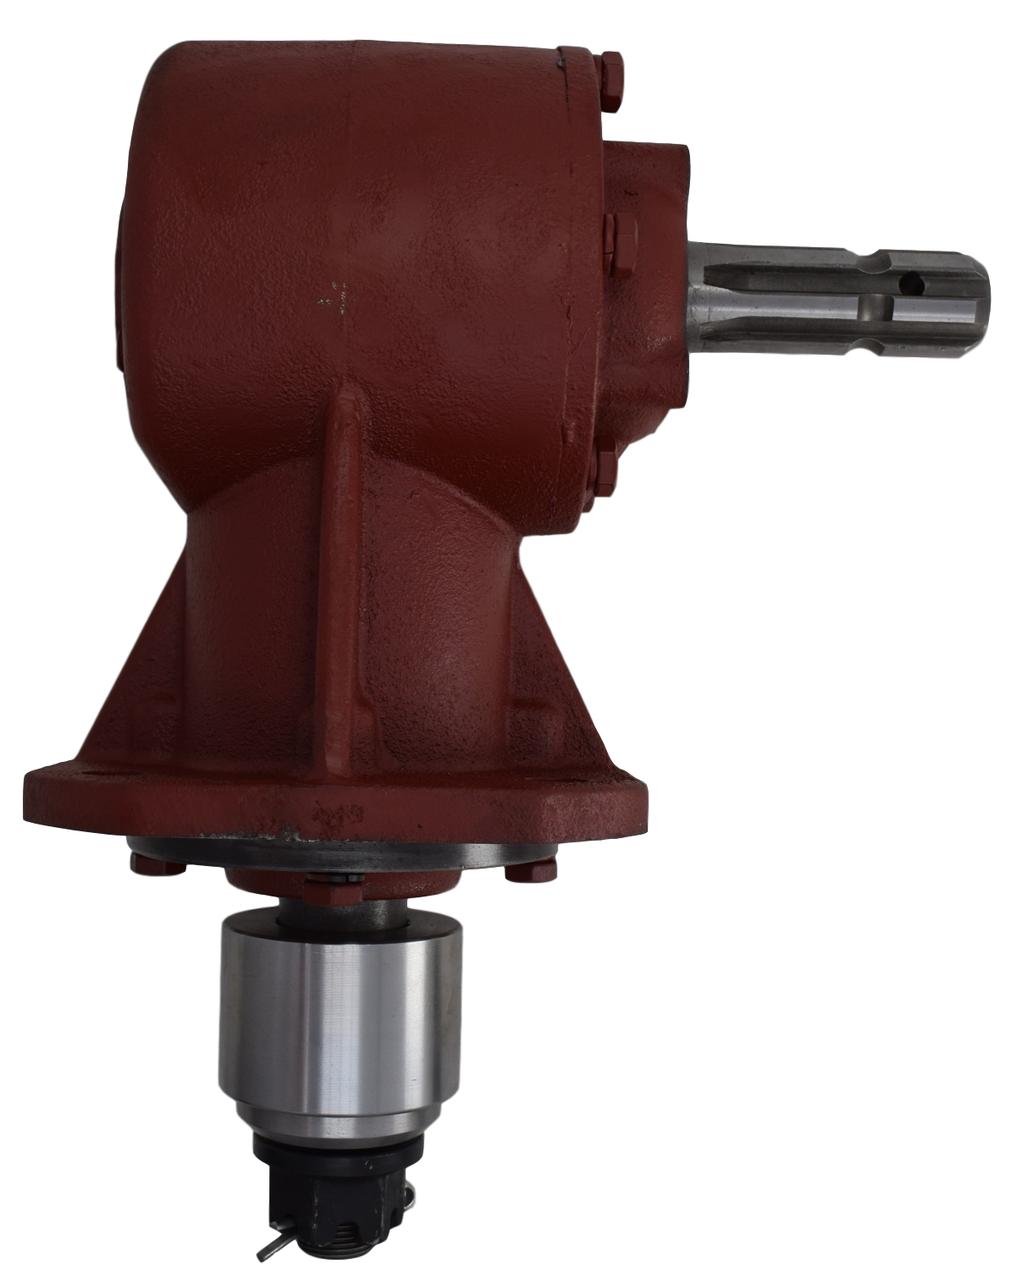 "40 HP Rotary Cutter Gearbox 1-3/8"" 6-Spline Input Shaft 1:1.47 Image"